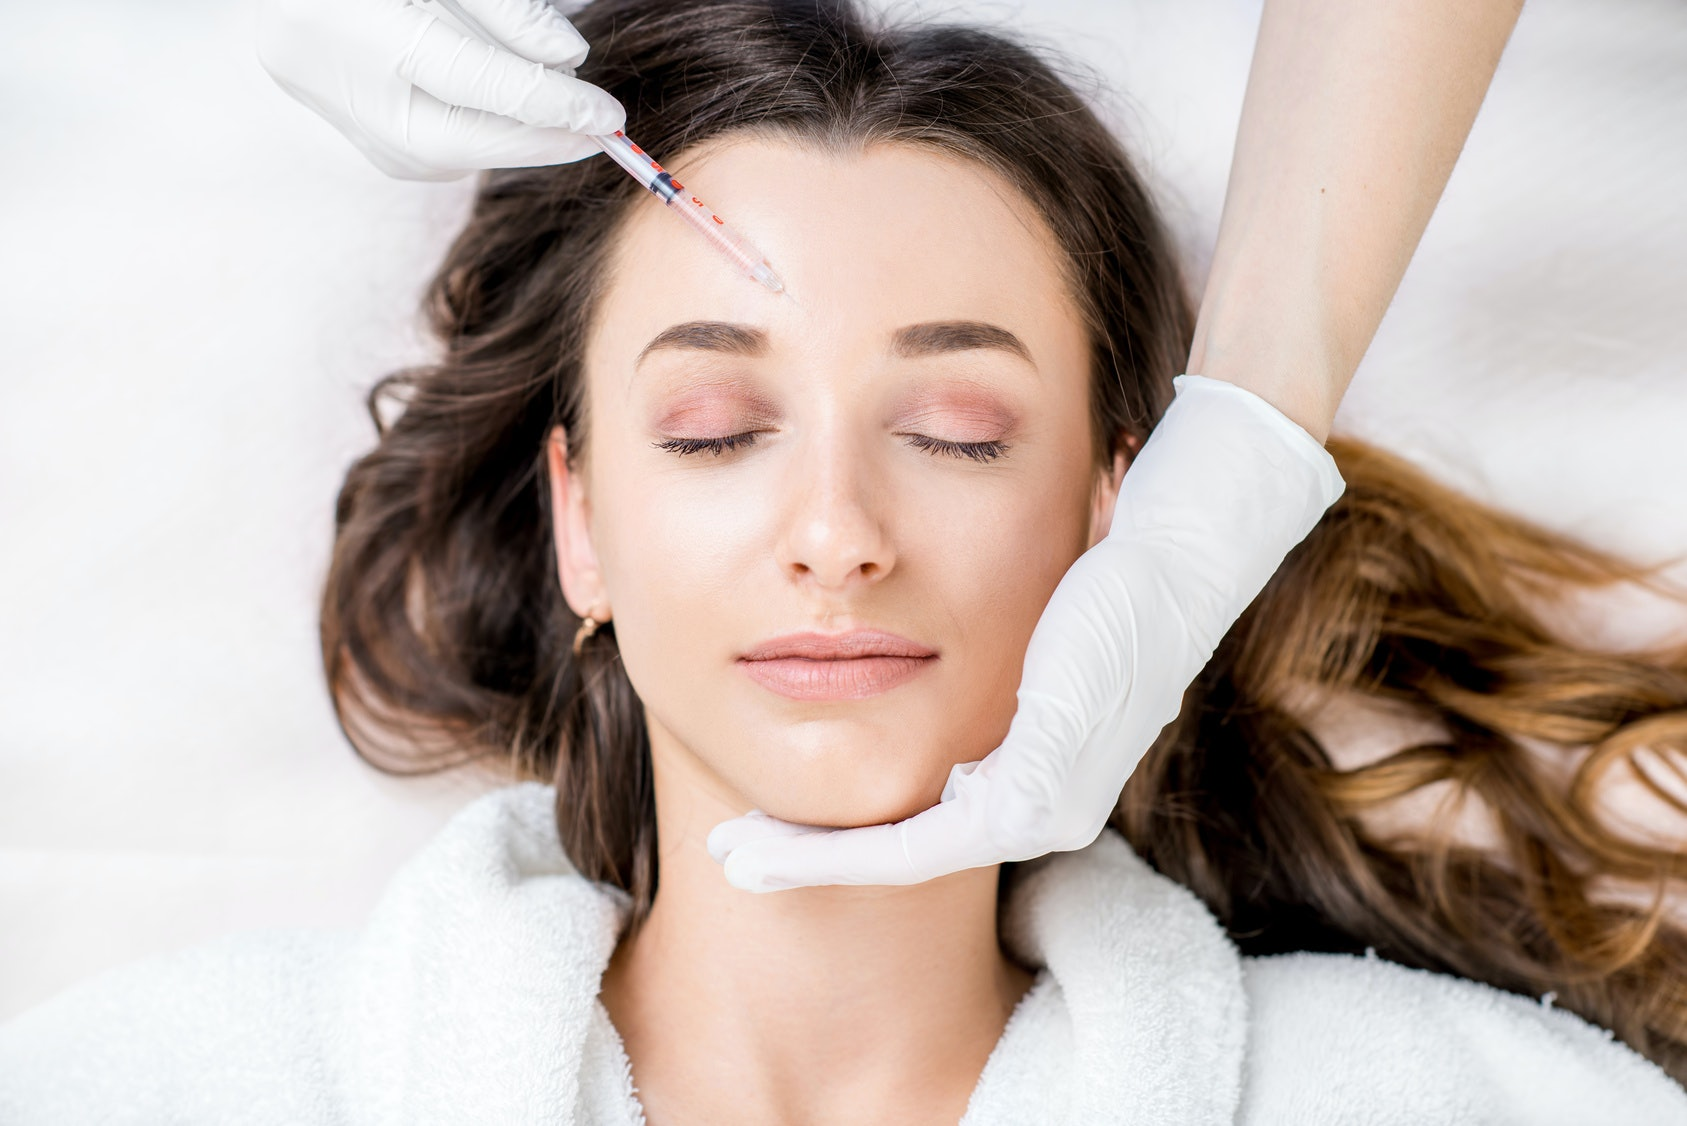 Danger of botox facial atrophy images 379